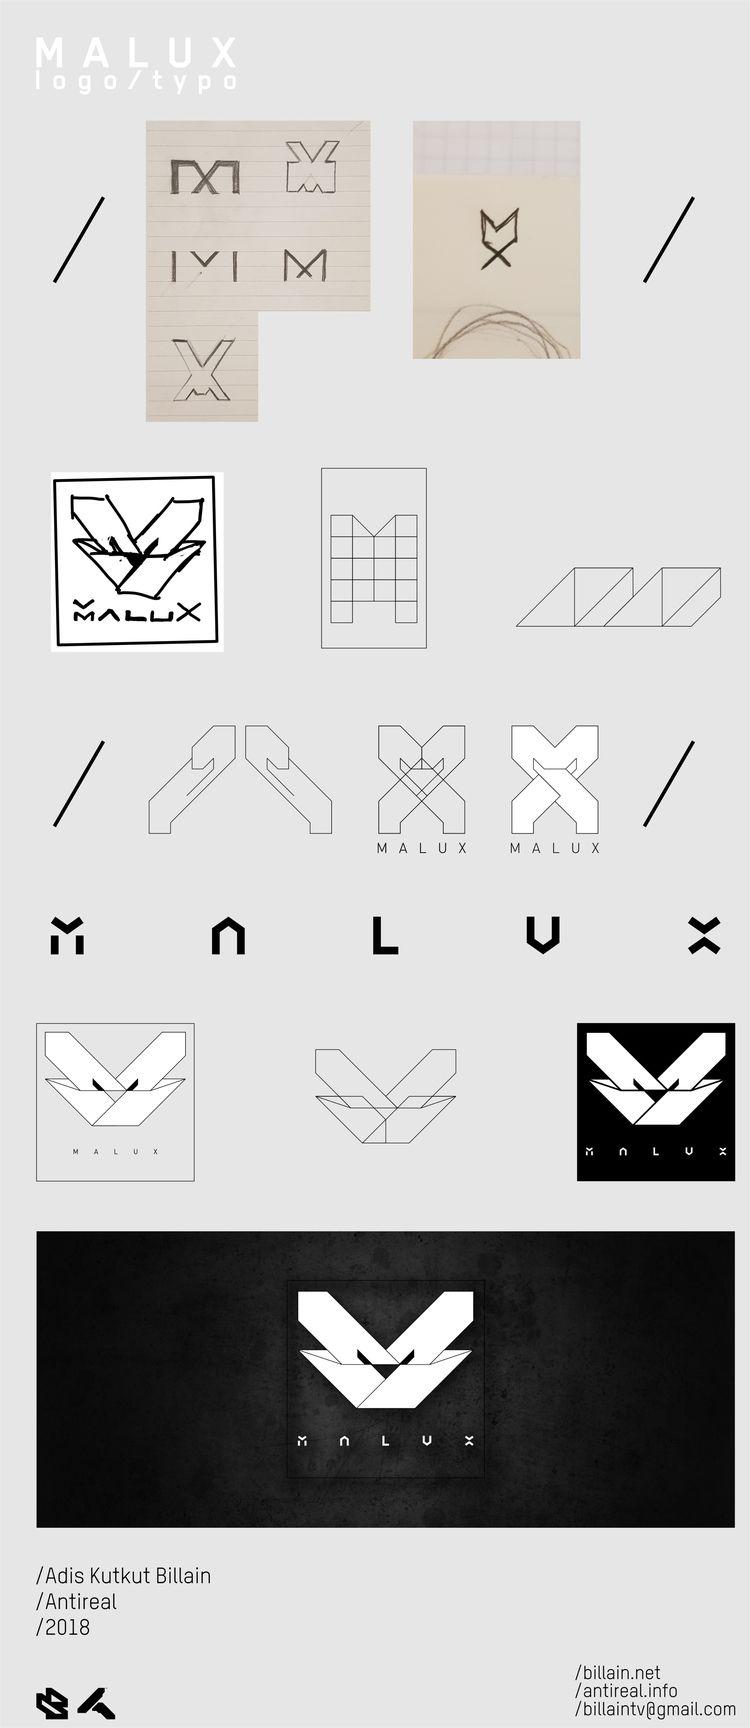 ID / Logotype Malux - billain | ello